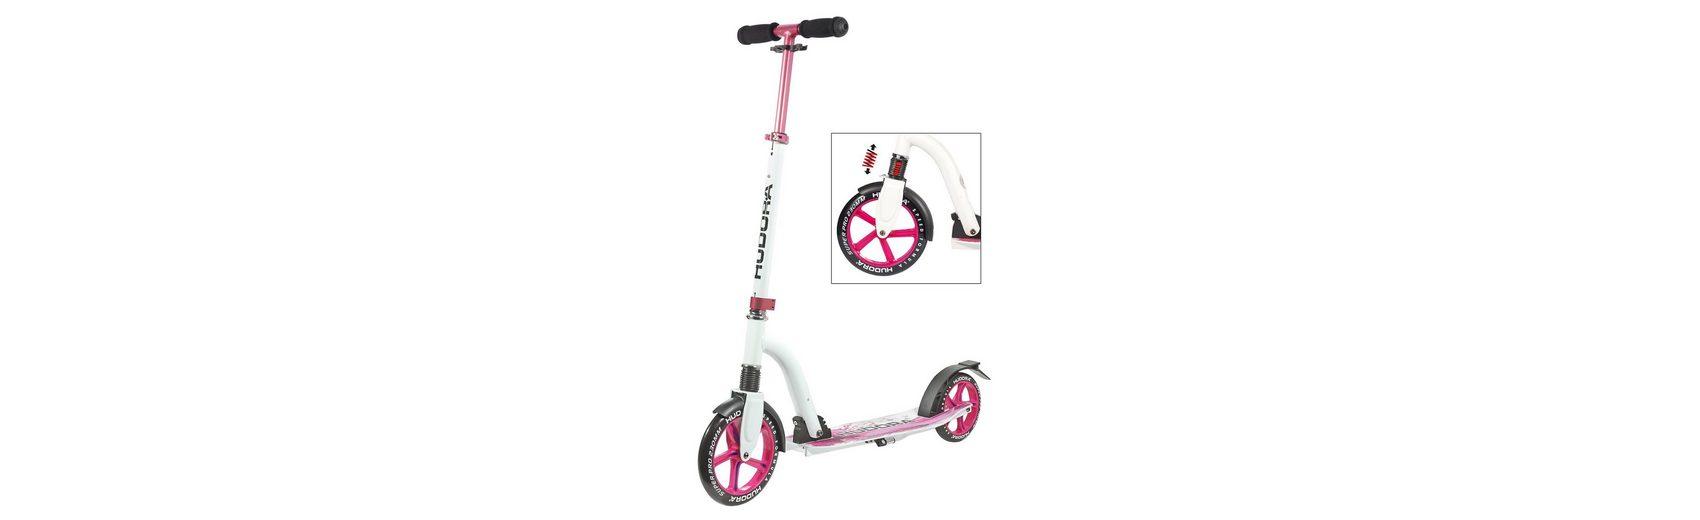 Hudora Scooter Bold Wheel Cushion, magenta